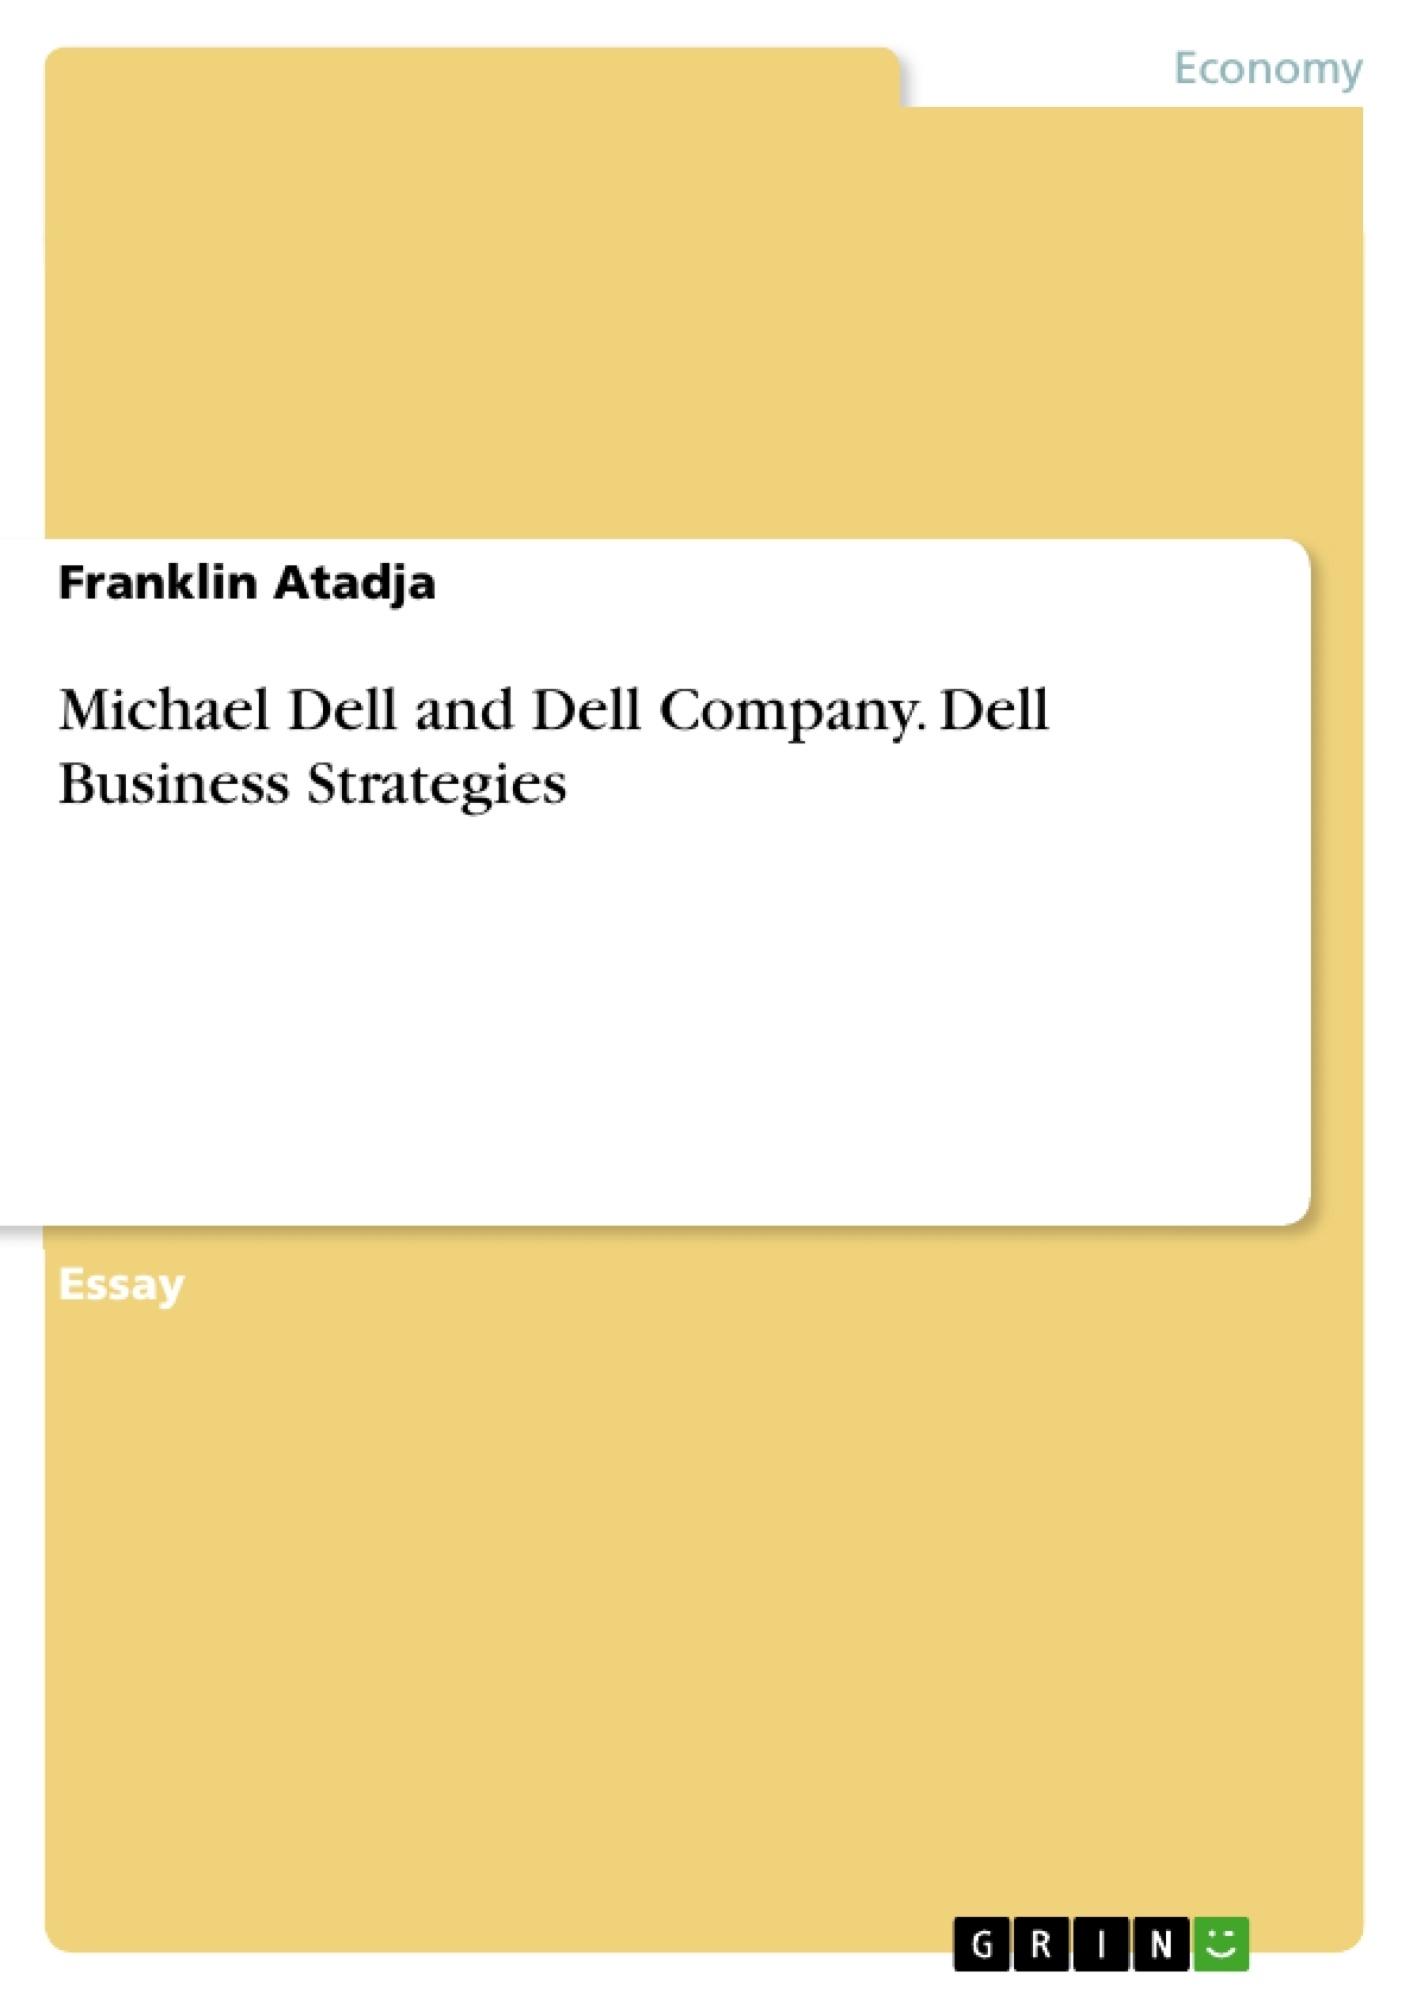 Title: Michael Dell and Dell Company. Dell Business Strategies